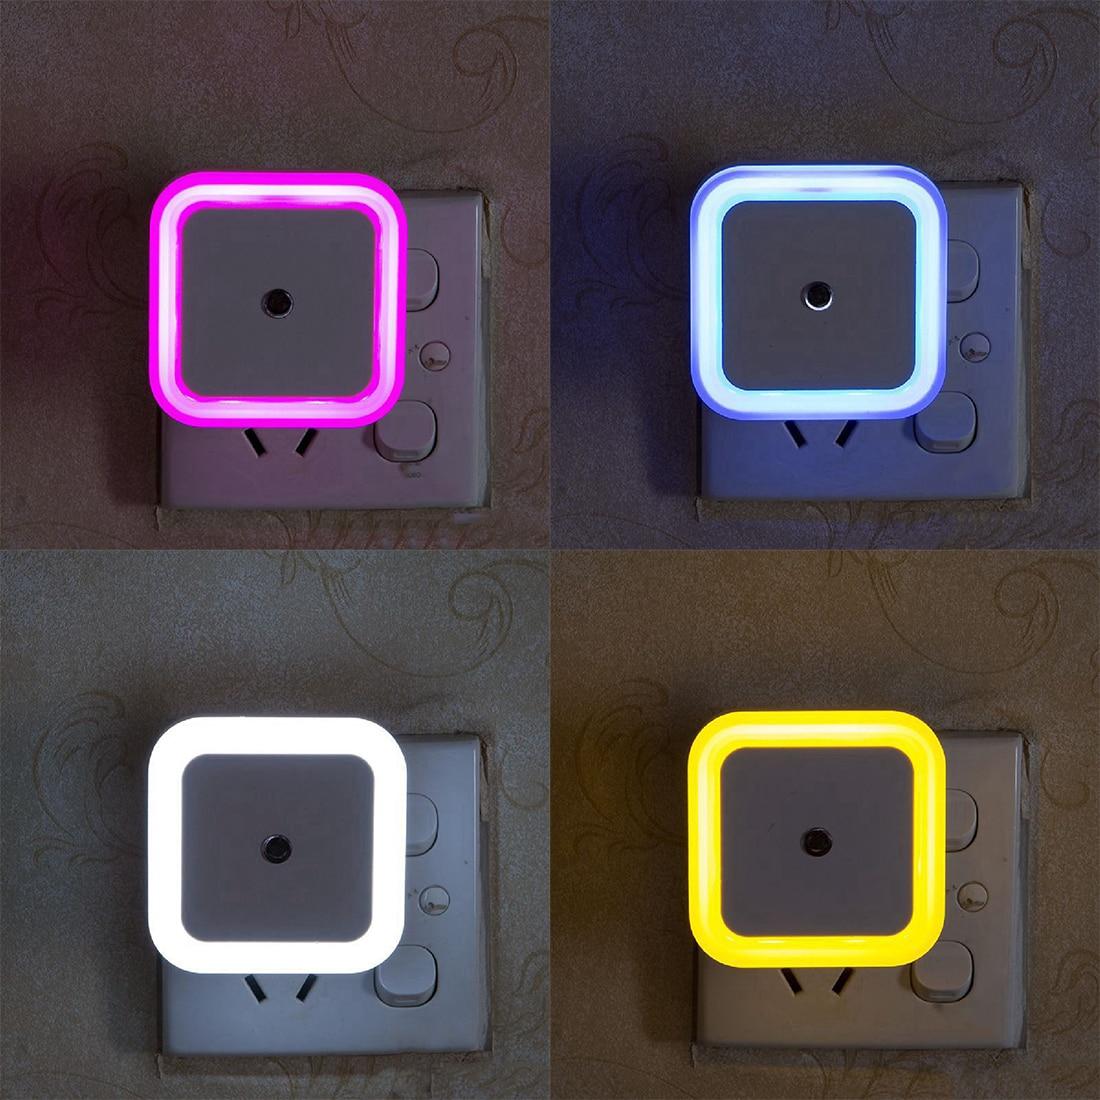 Multi Color 1pcs Light Sensor Control LED Night Light US Plug Novelty Bedroom Lamp For Baby Kids Gifts Luminaire Sleep Light